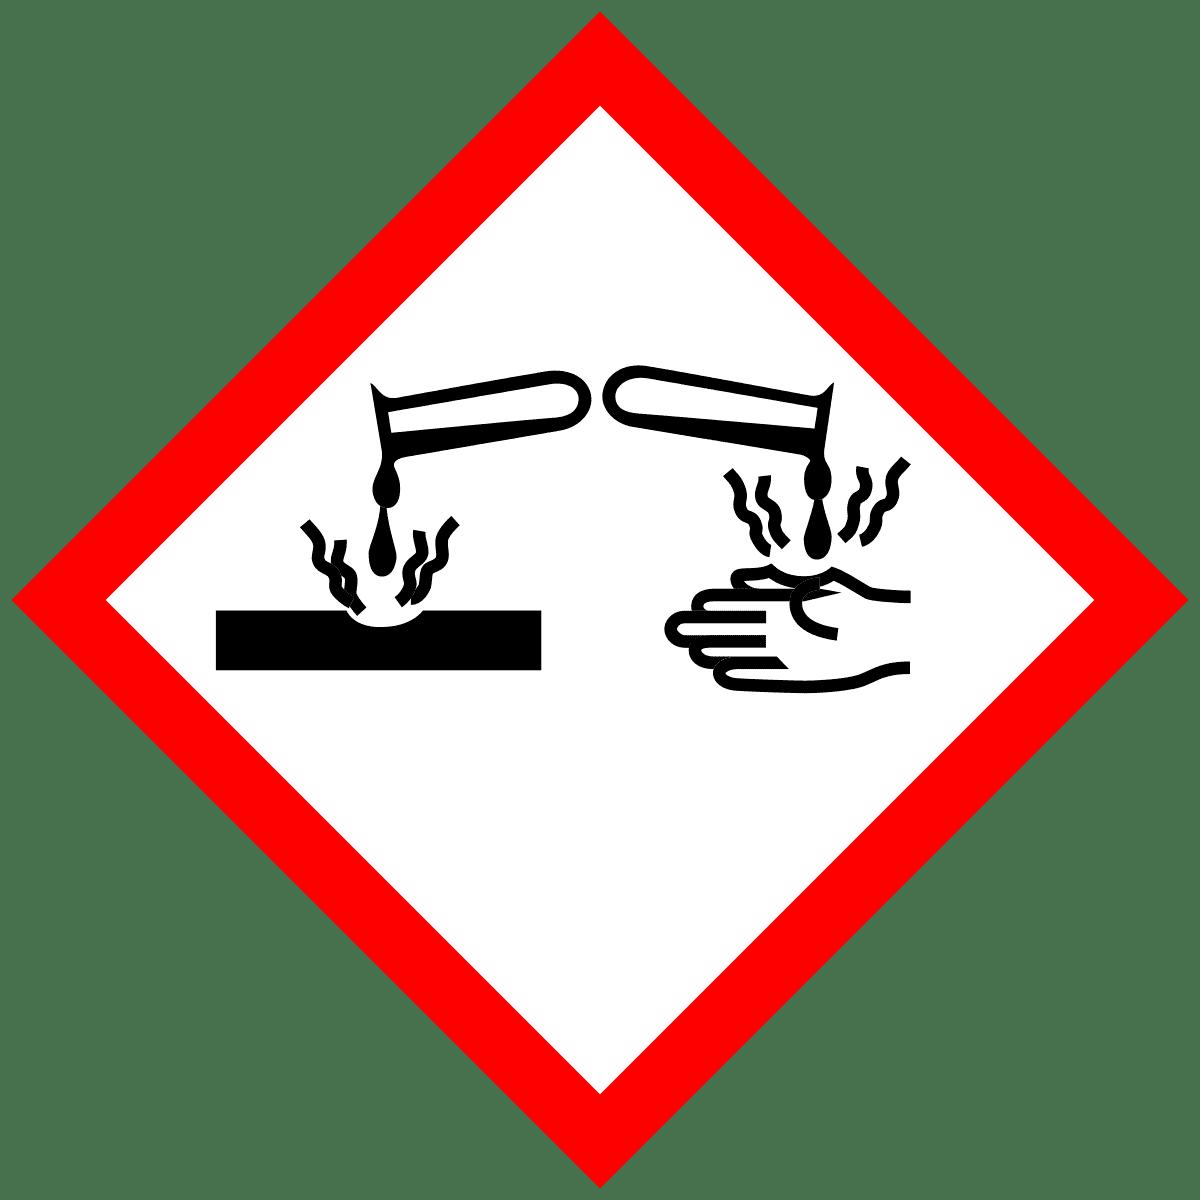 Bijtend of corrosief